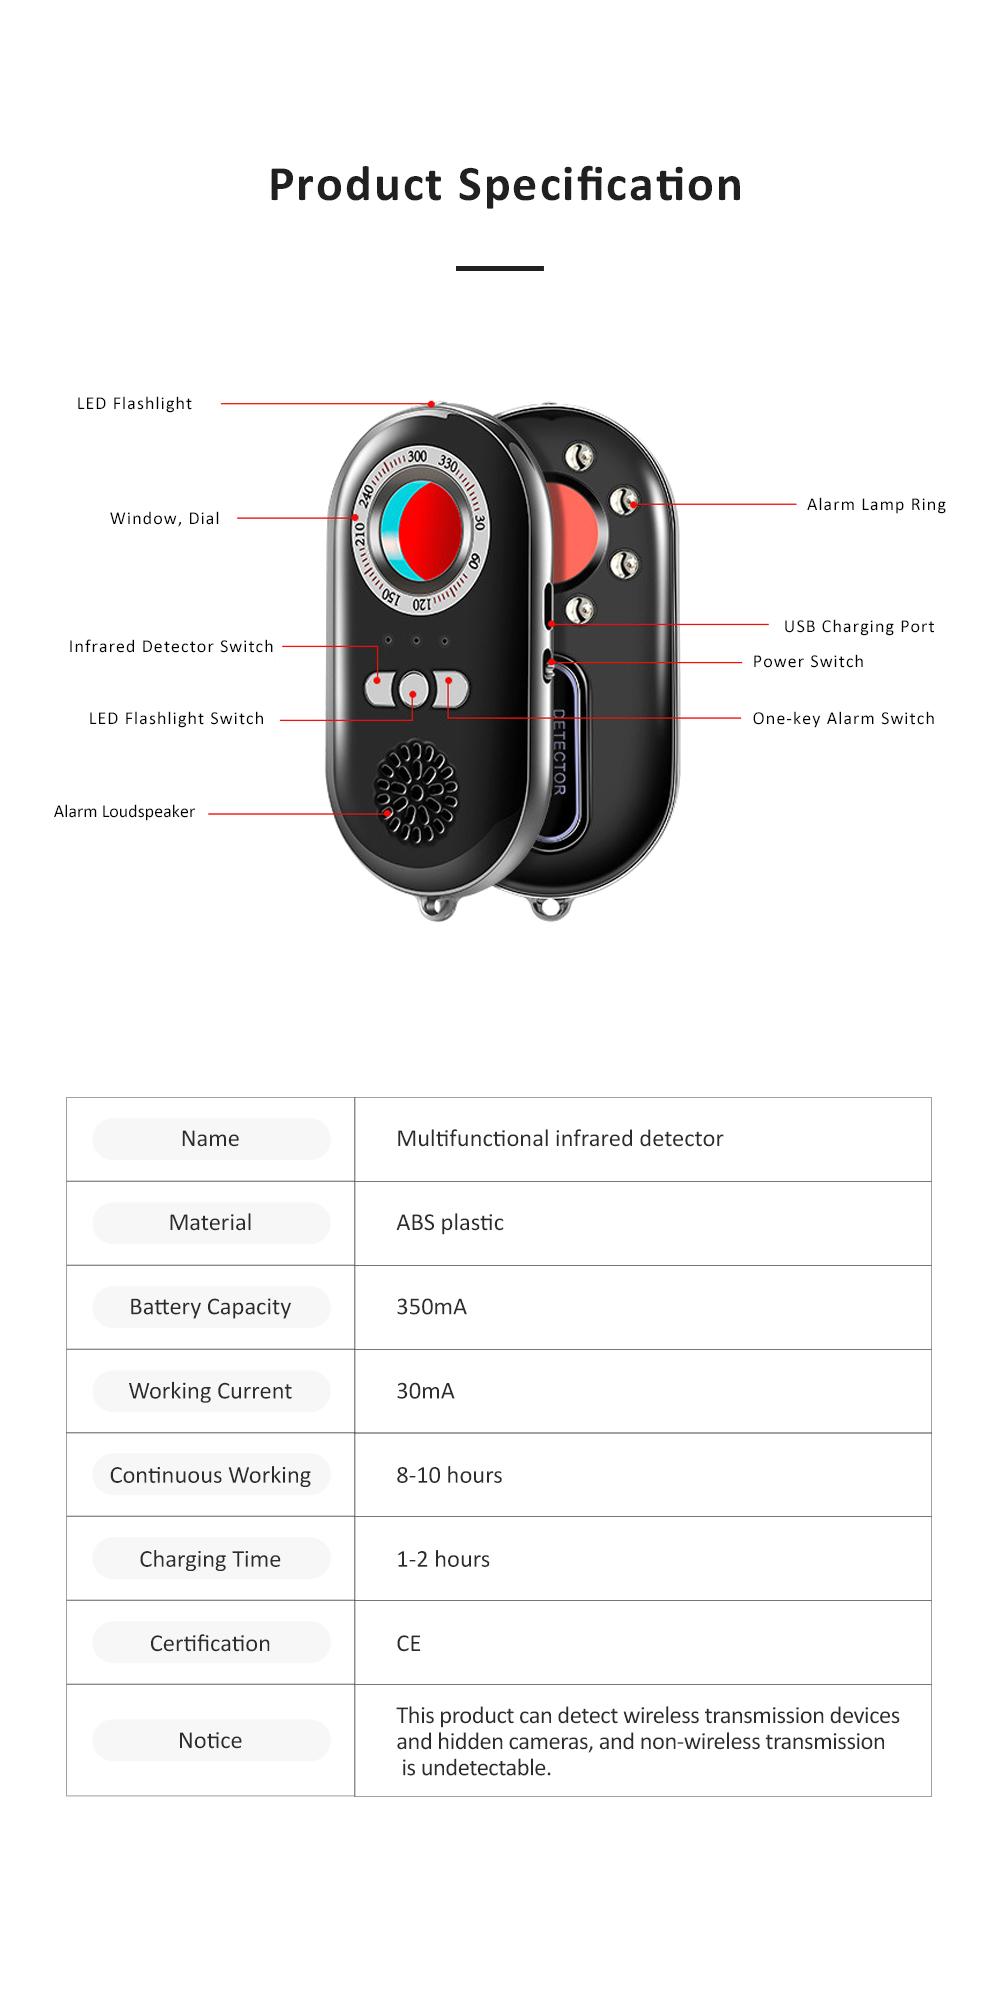 Portable Multifunctional Hotel Infrared Pin Hole Camera Detector Spy Prevention Led Flashlight Alarm Apparatus Alertor Traveling Tool 7